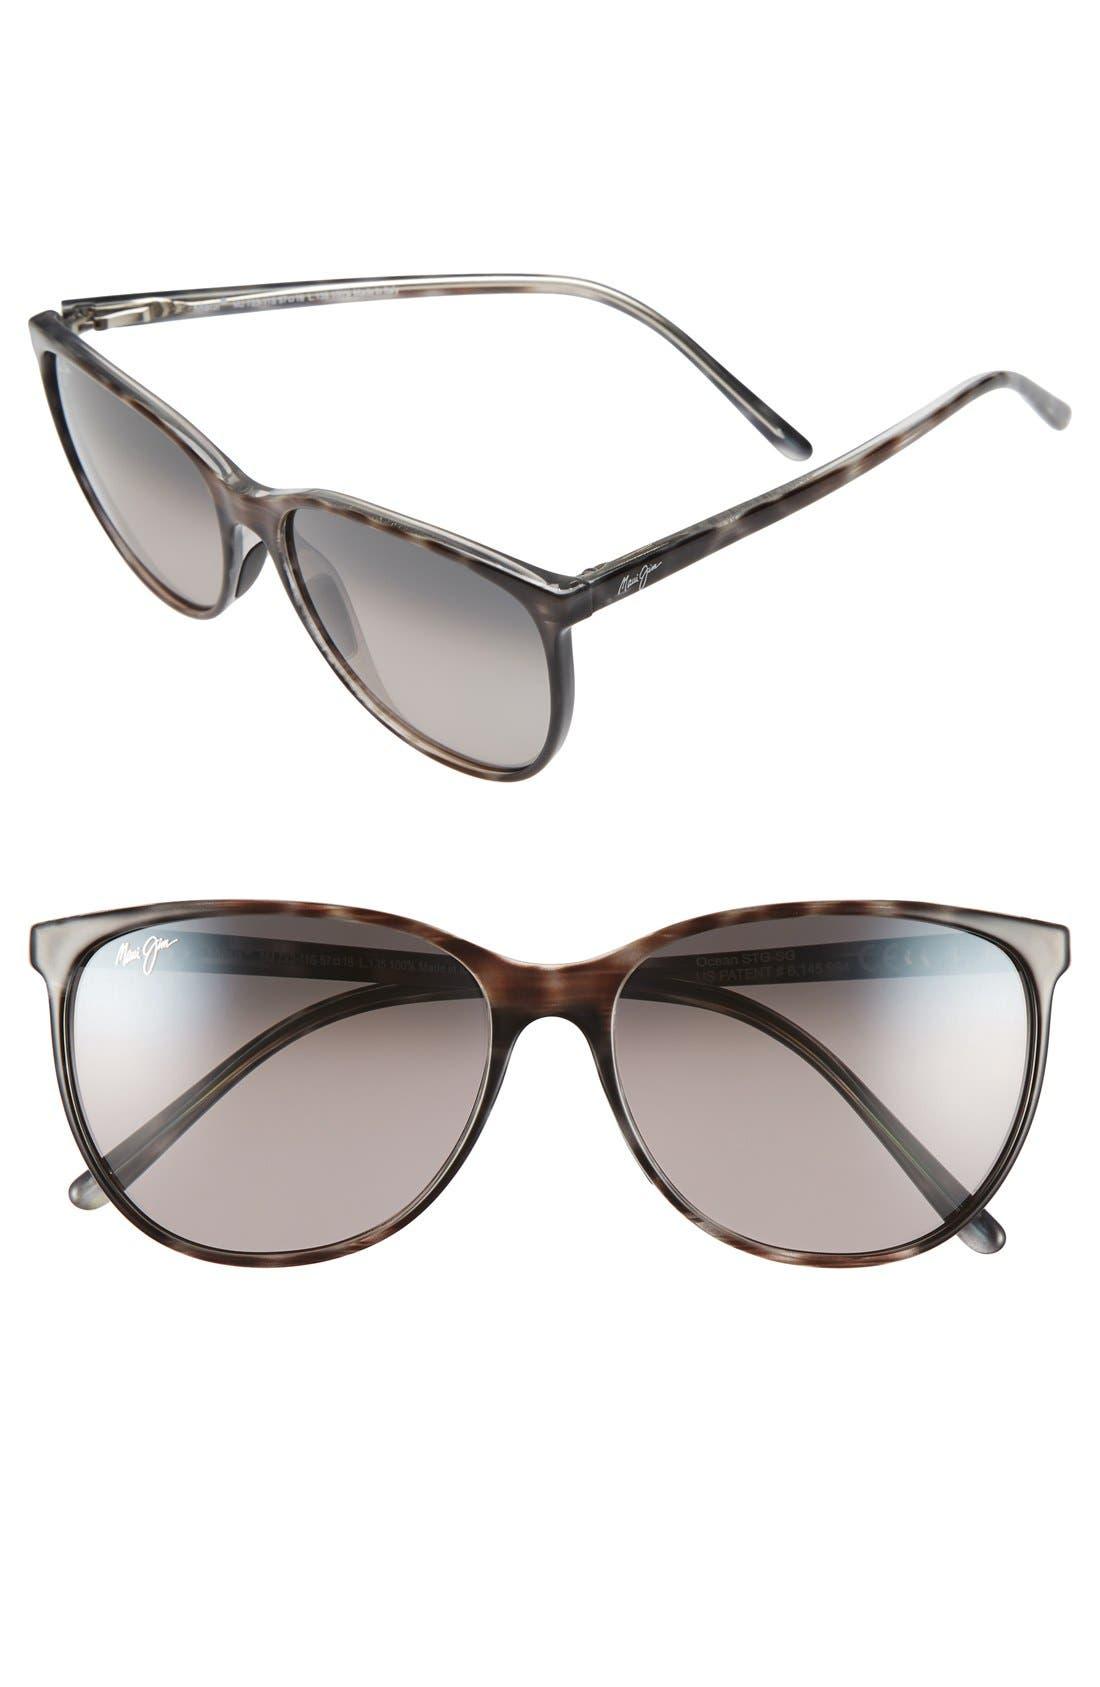 Maui Jim Ocean 57Mm Polarizedplus2 Sunglasses - Grey Tortoise Stripe/ Grey